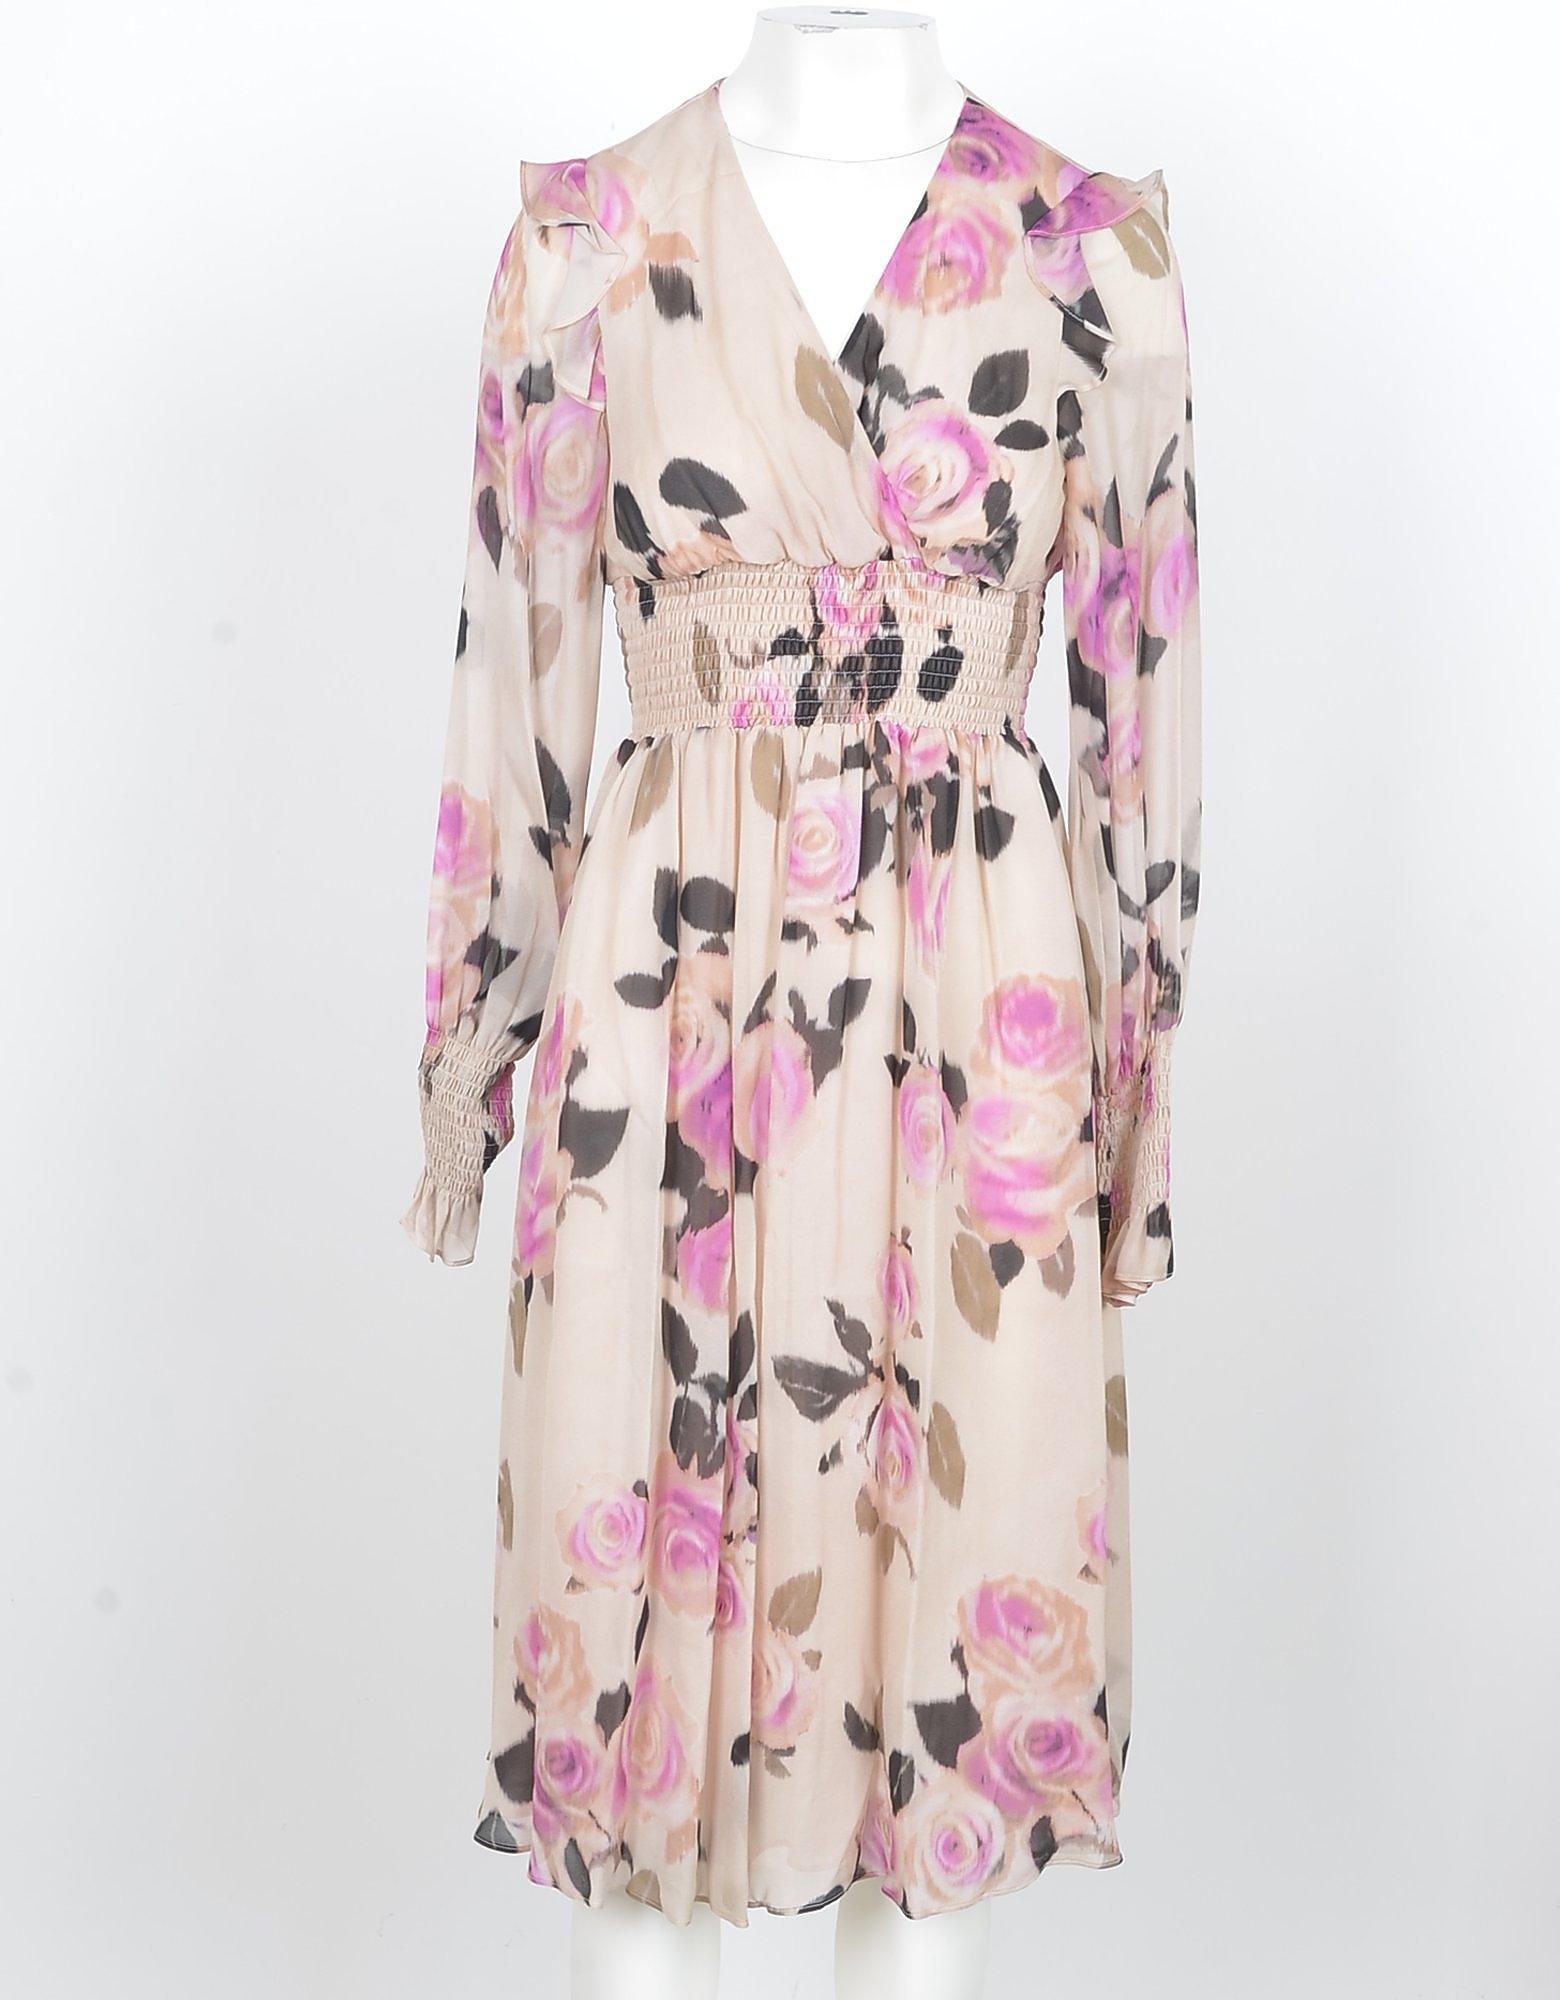 Pinko Designer Dresses & Jumpsuits, Beige and Pink Viscose Women's Midi Dress